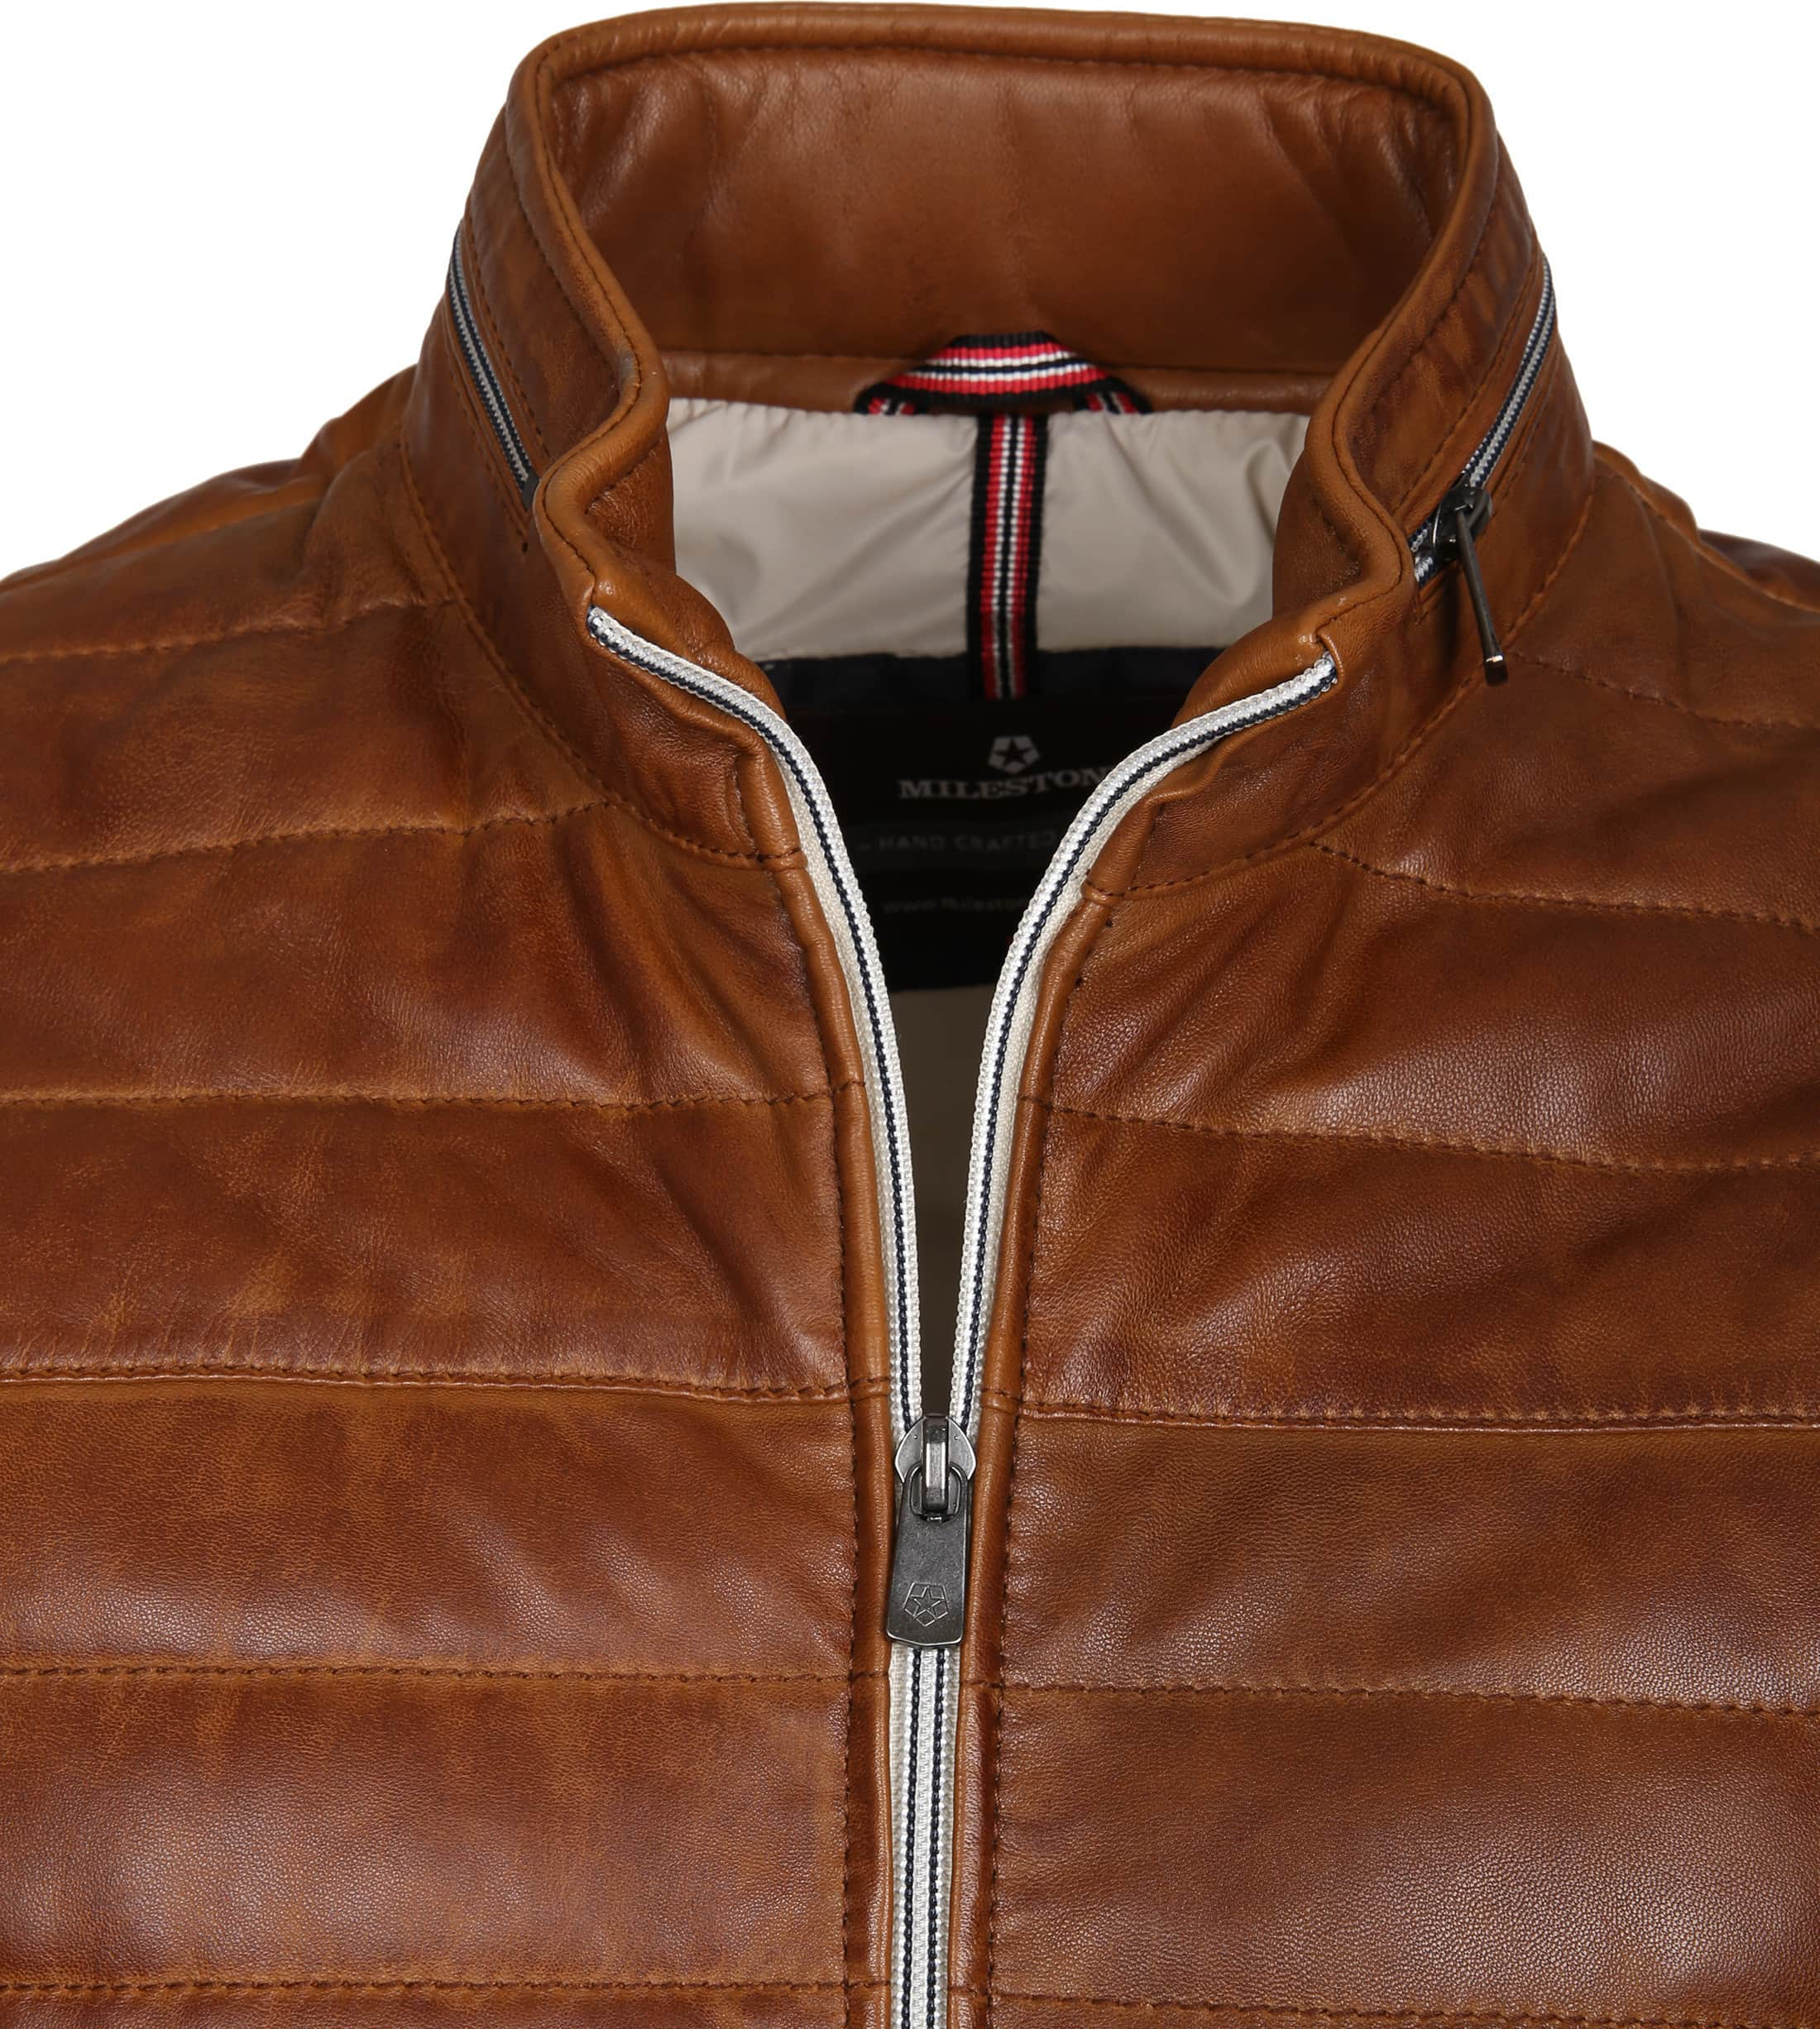 Milestone Tereno Leather Jacket Cognac foto 1